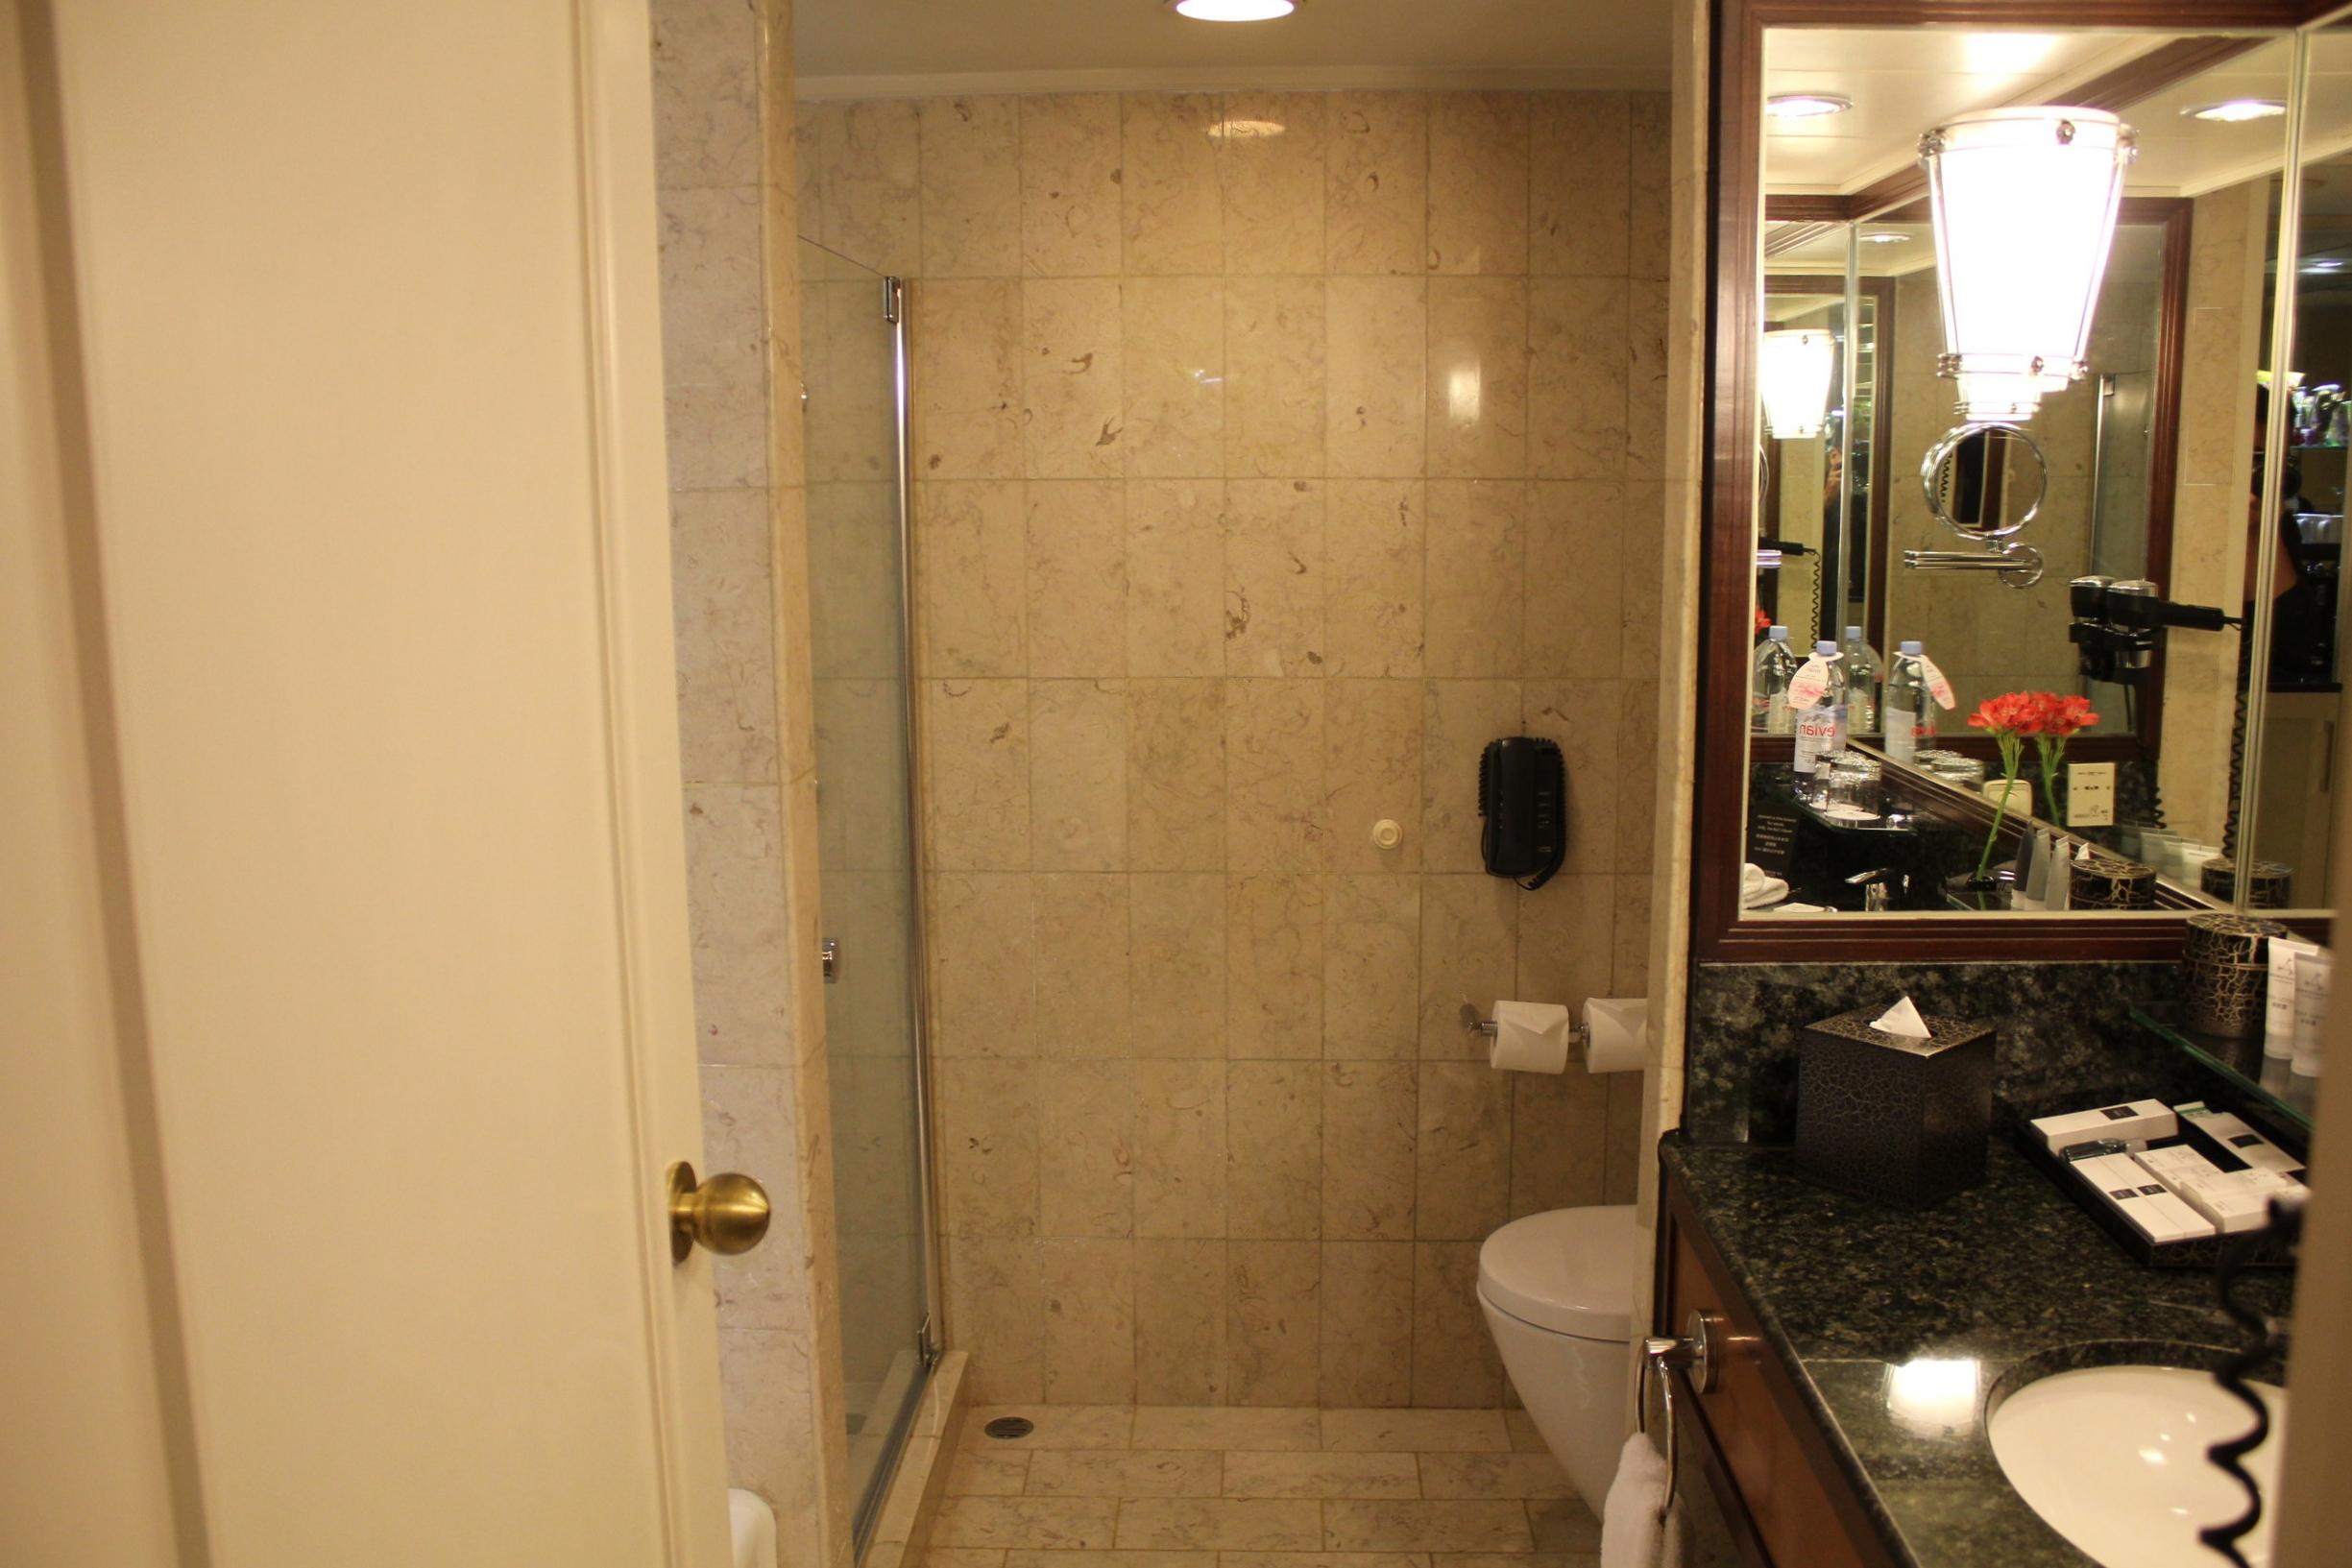 JW Marriott Hong Kong – Bathroom